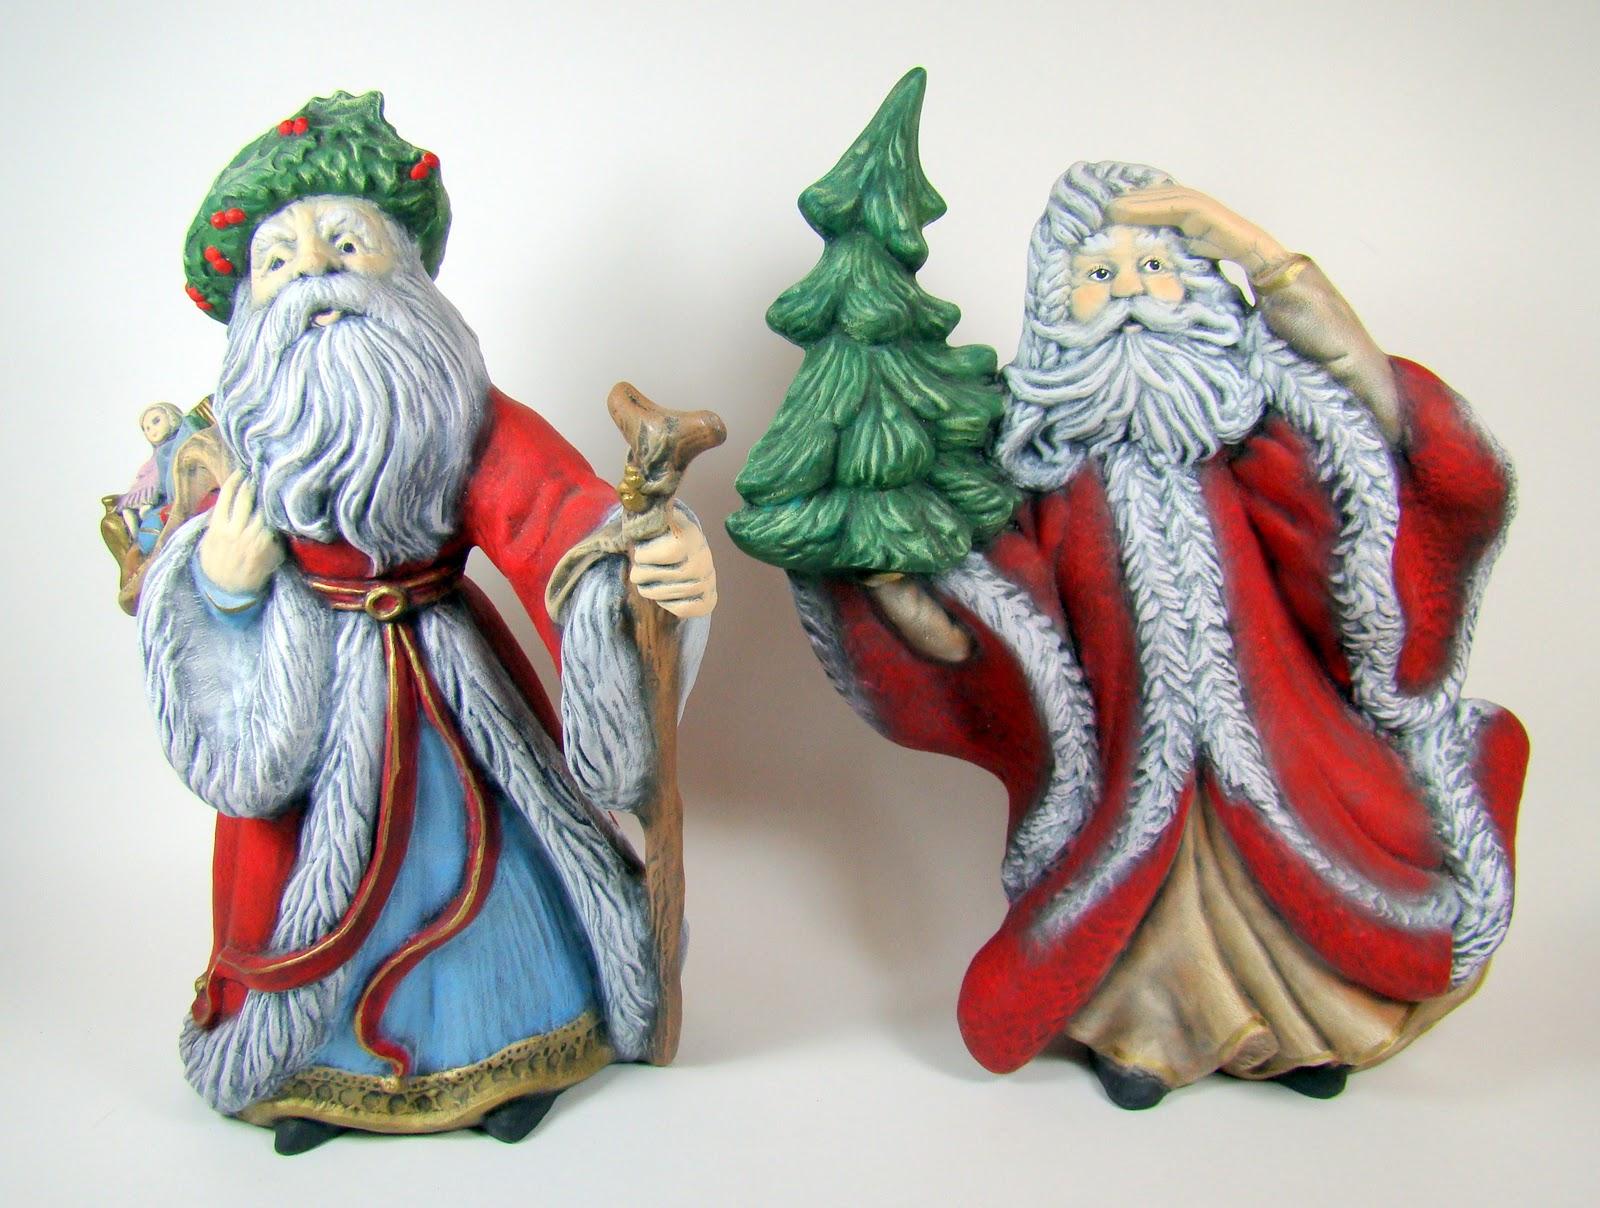 Magnolia's Attic: Old World Santas